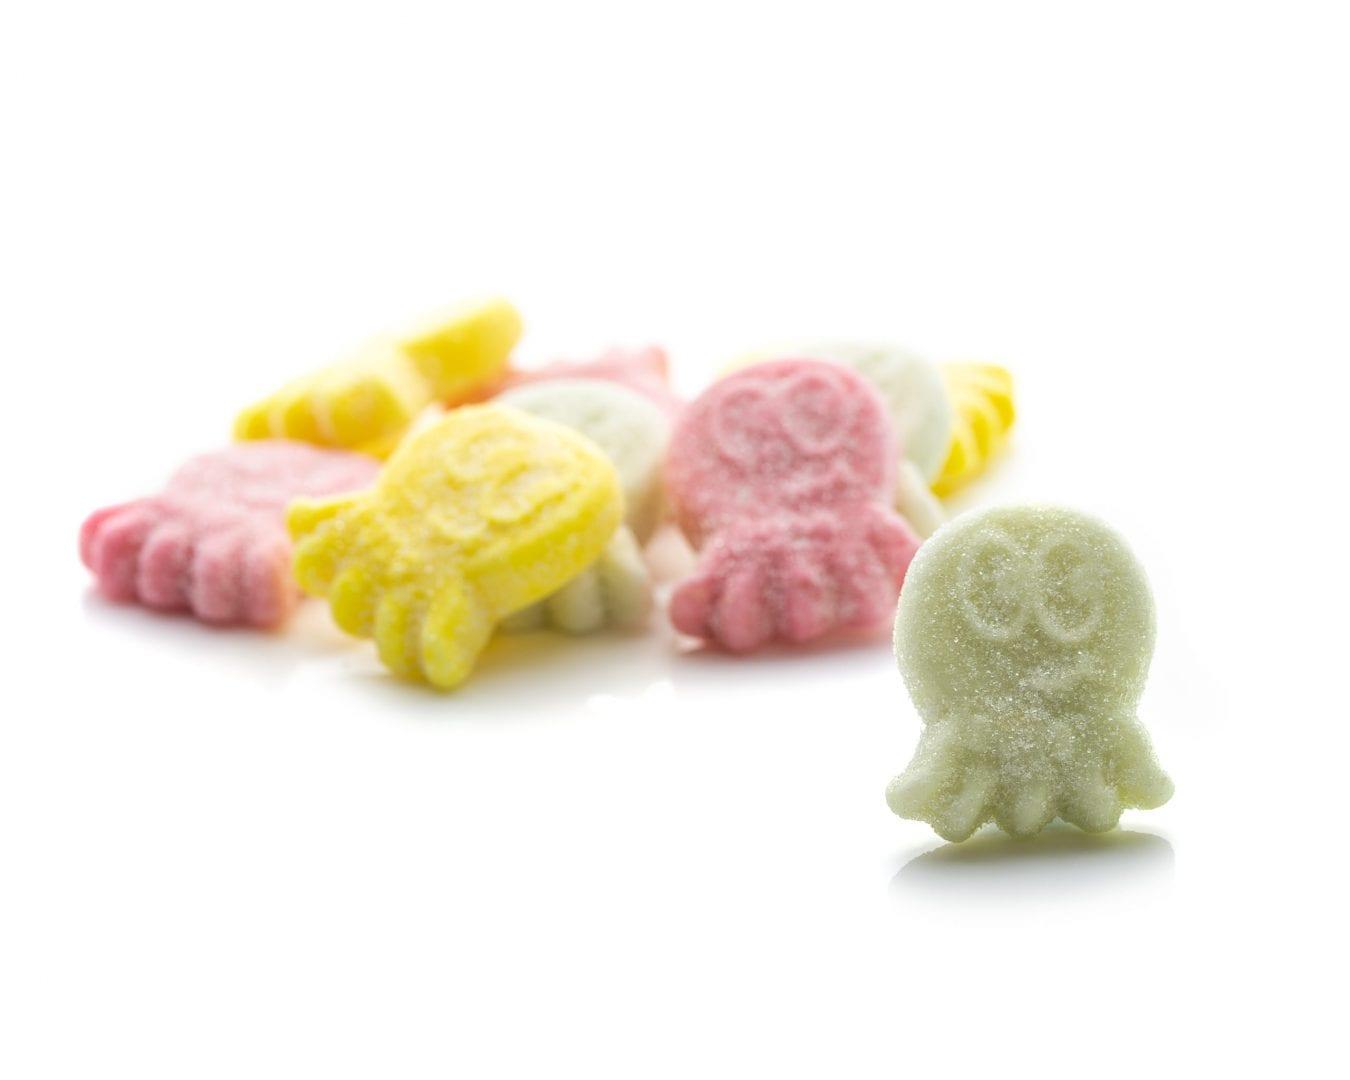 Eat Liquorice - Octopus Sours Vegan Vegetarian Gluten Free Palm Oil Free Soya Free Swedish Jellies Bubs